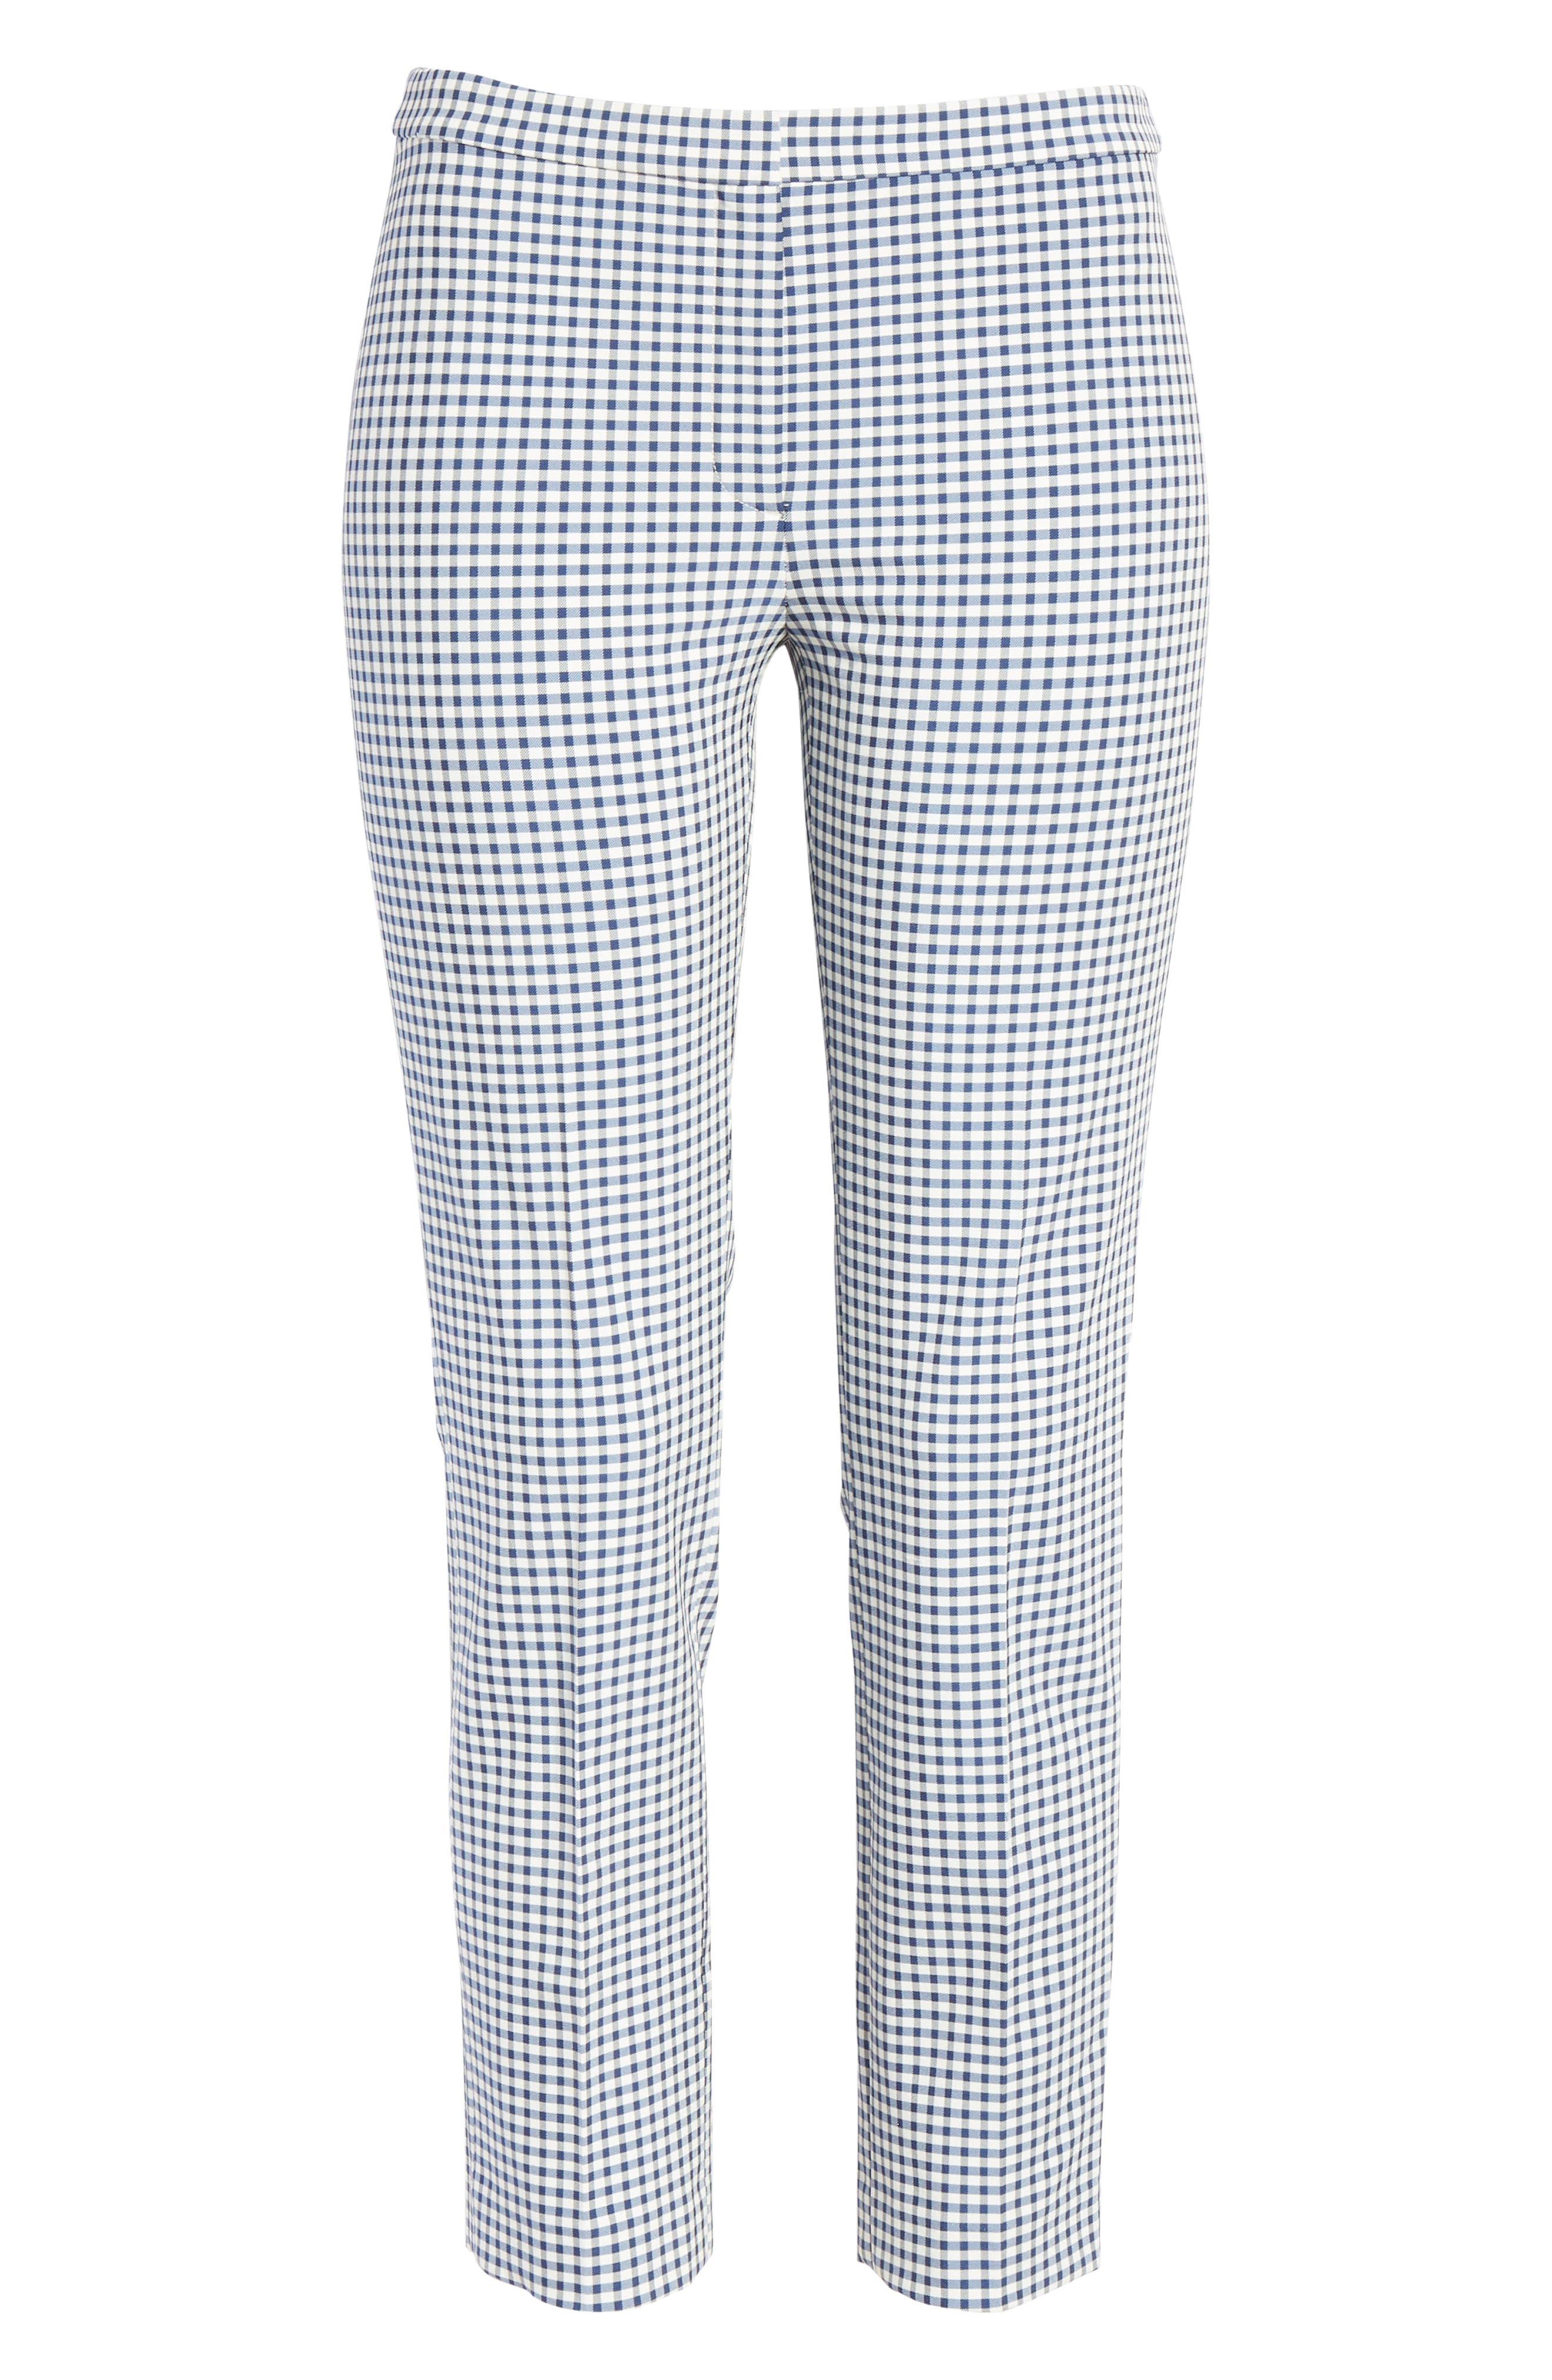 Gingham Check Skinny Pants,                             Alternate thumbnail 6, color,                             BLUE MULTI